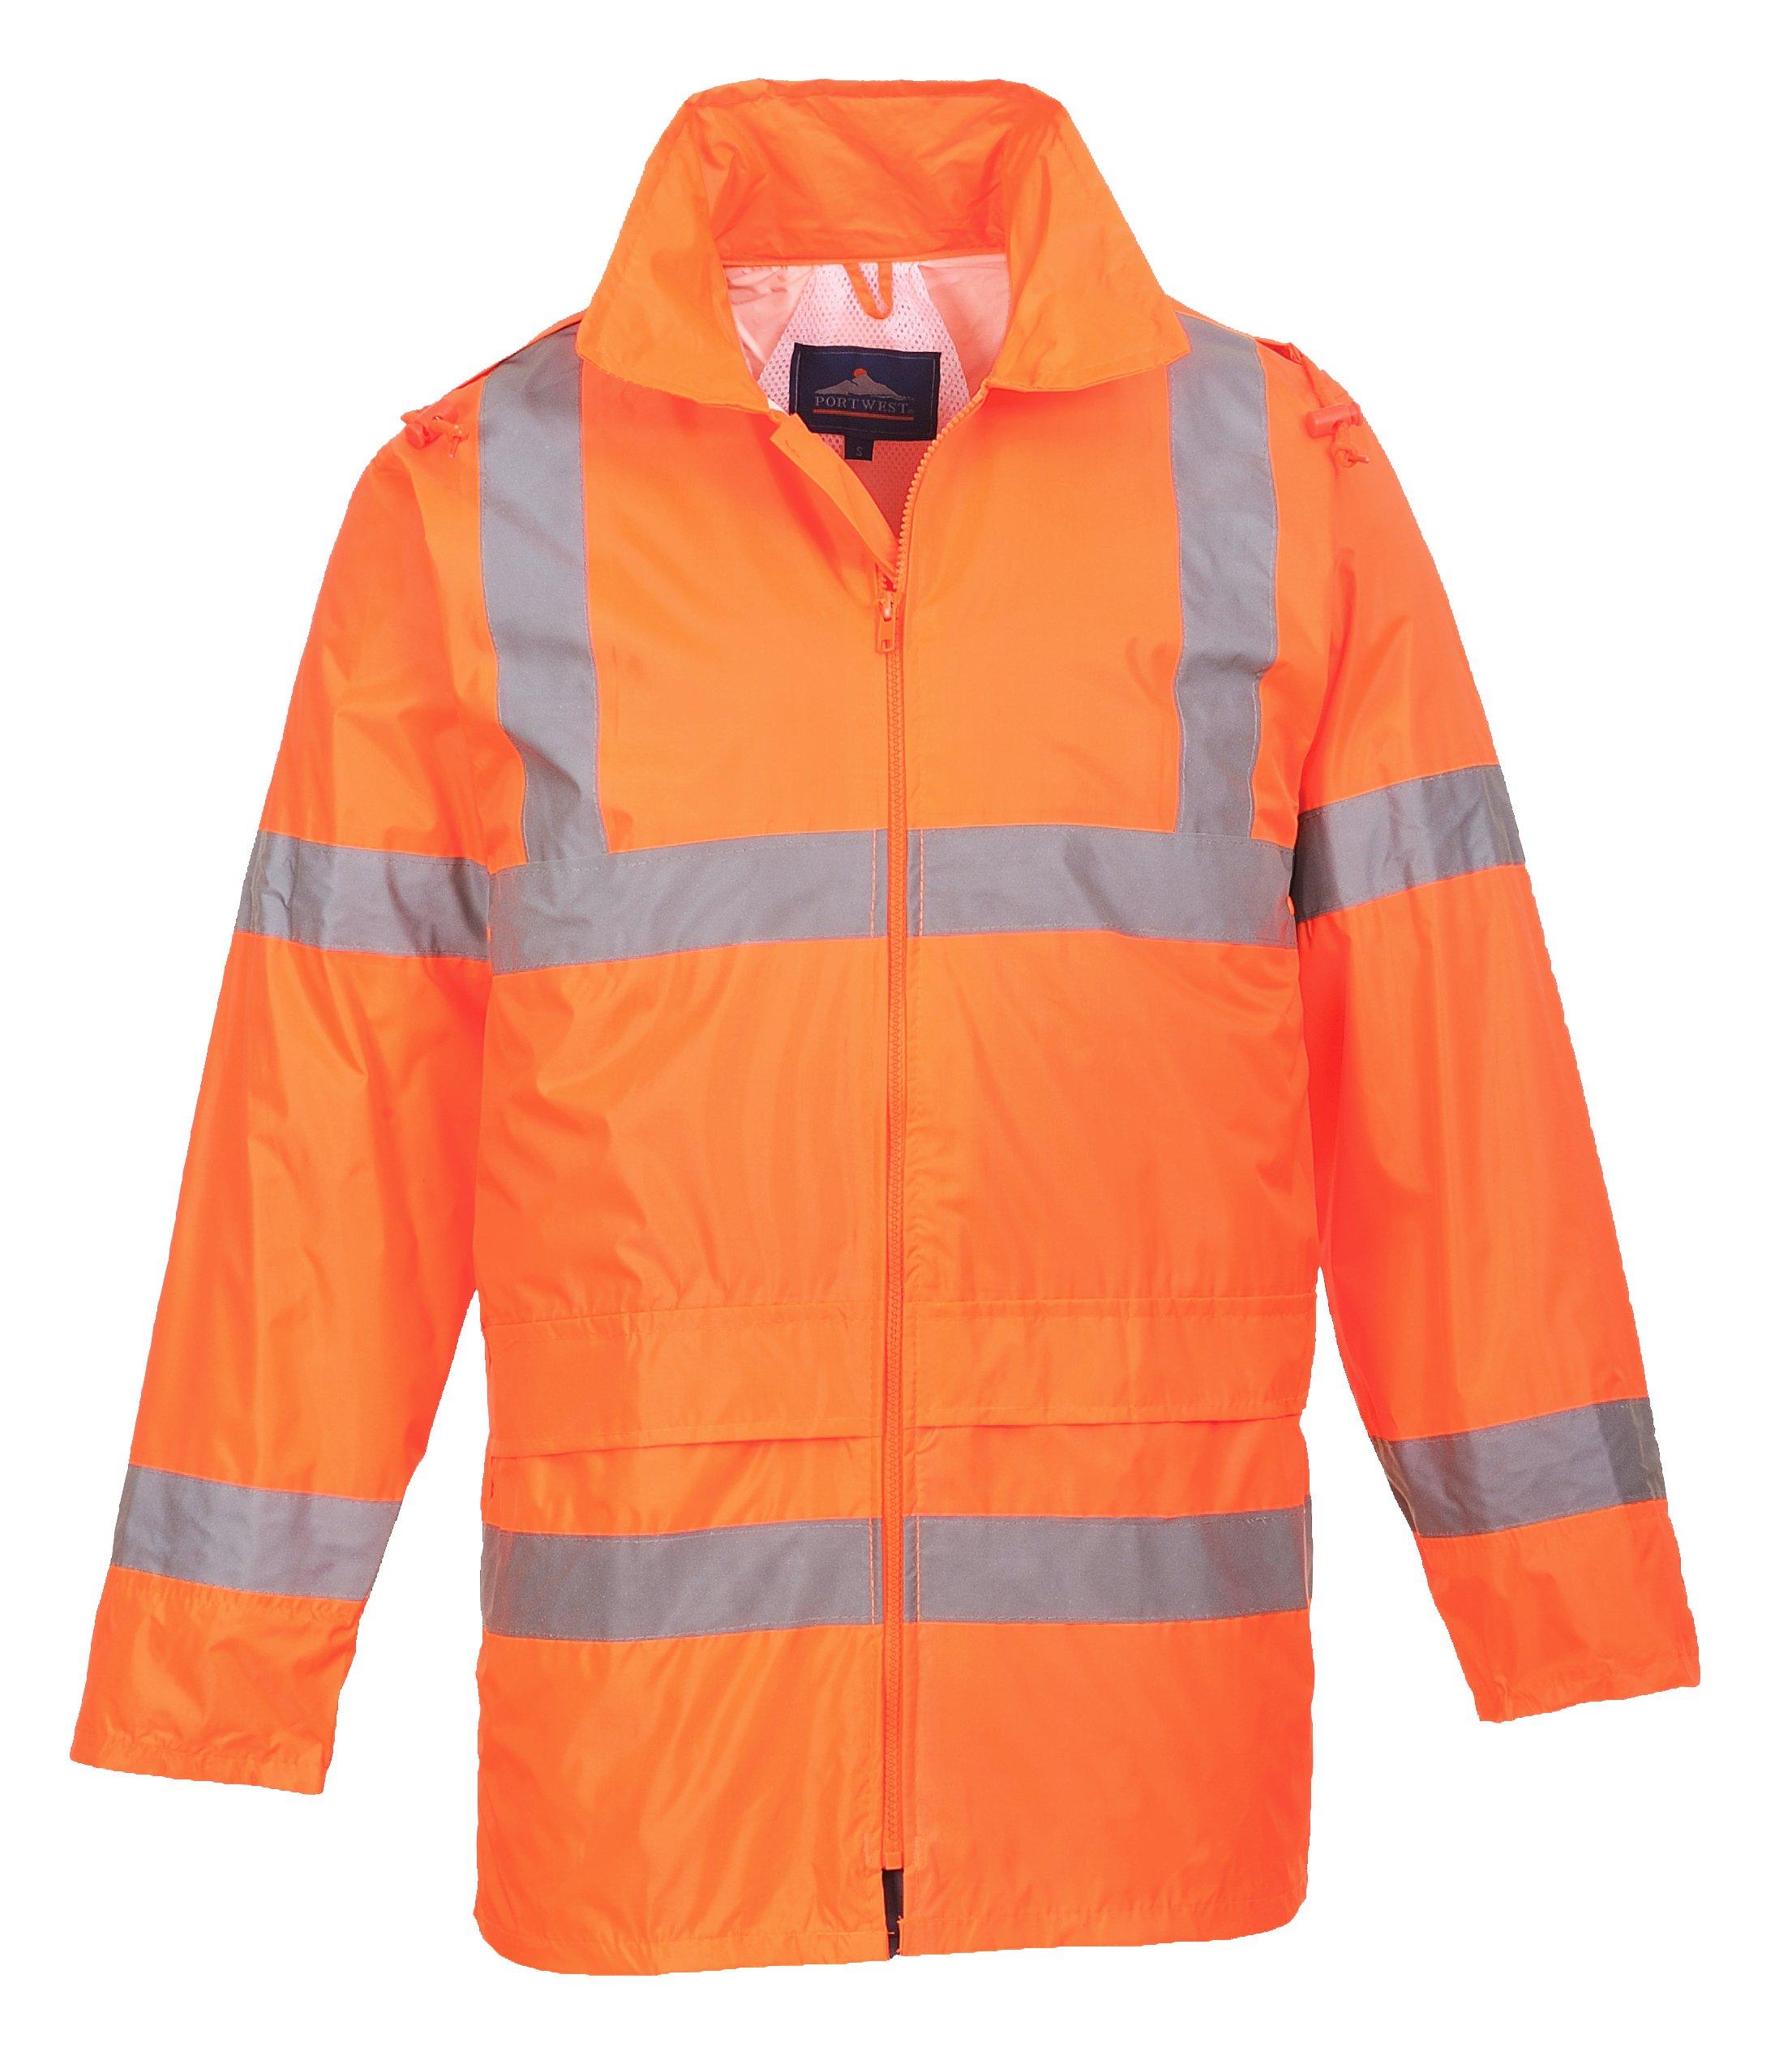 Portwest Waterproof Rain Jacket, Lightweight, Orange, X-Large